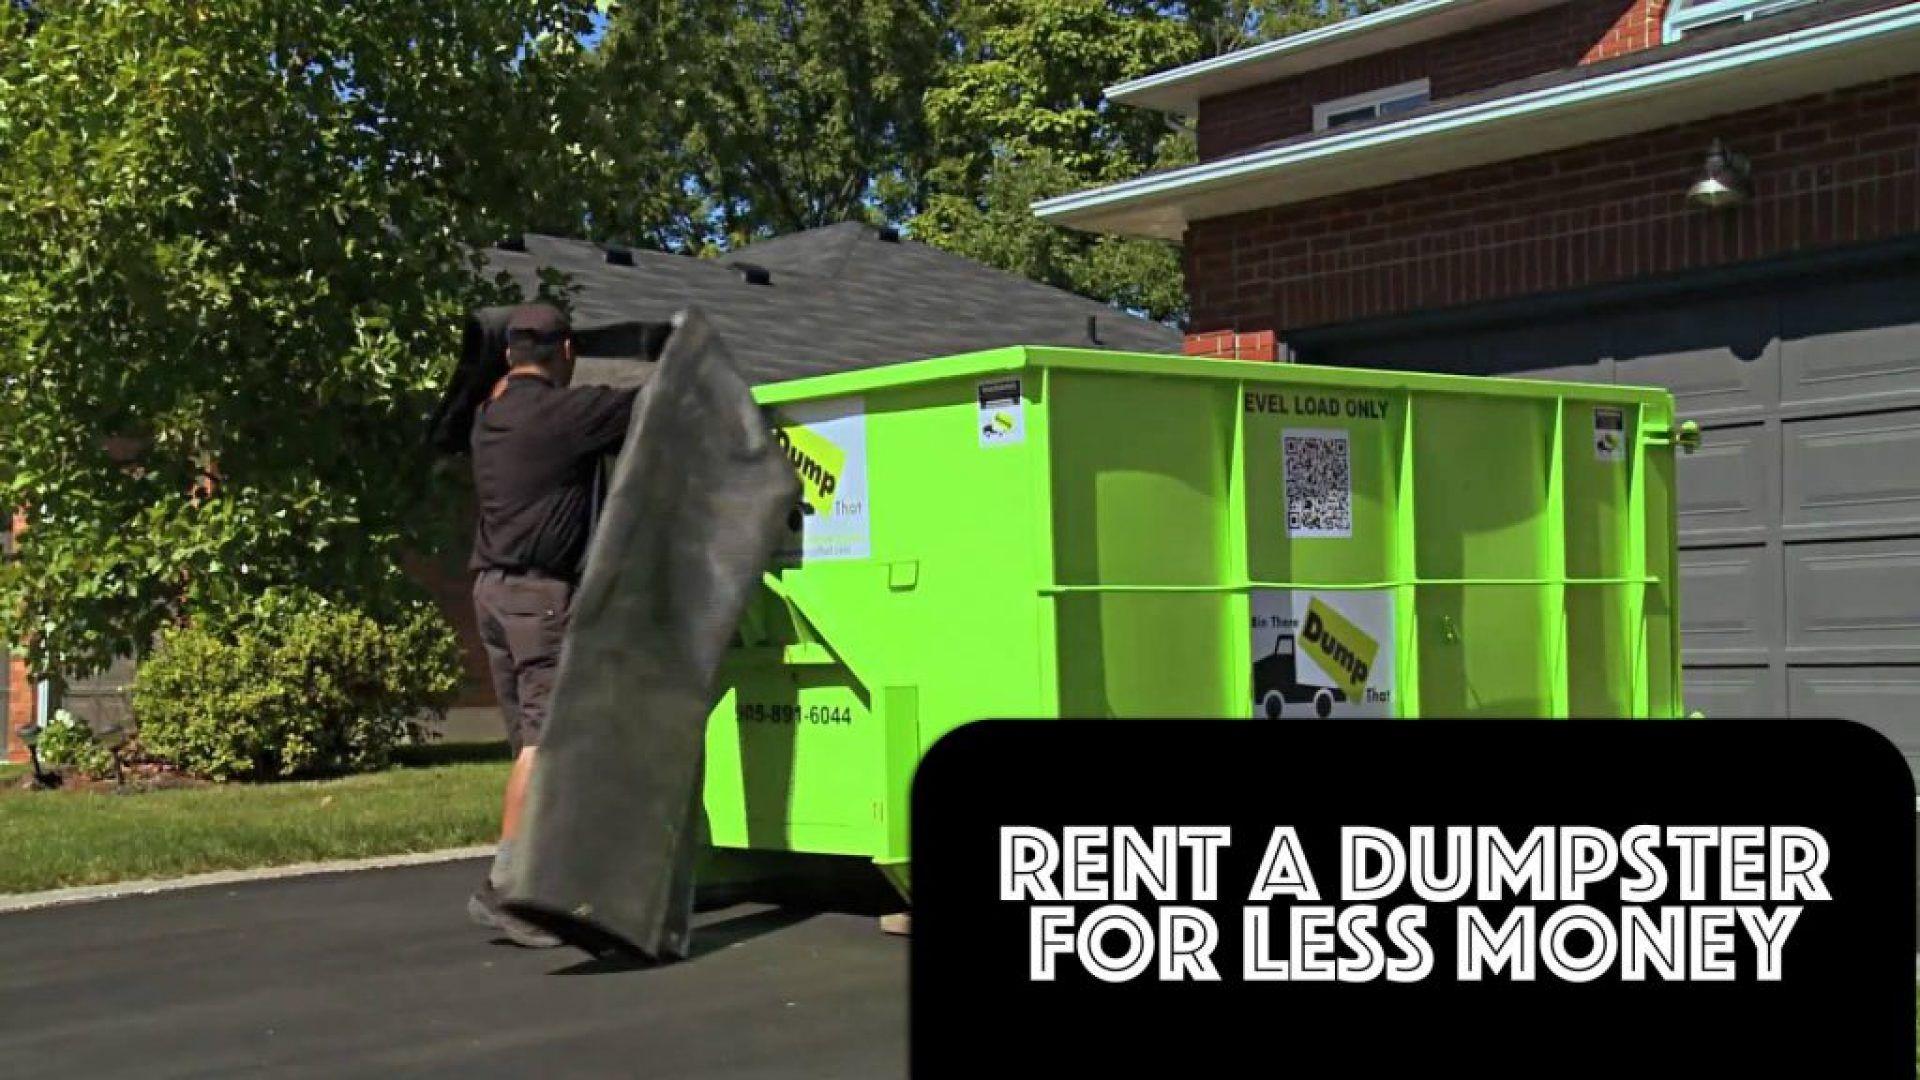 How to rent a dumpster twins rent a dumpster rent